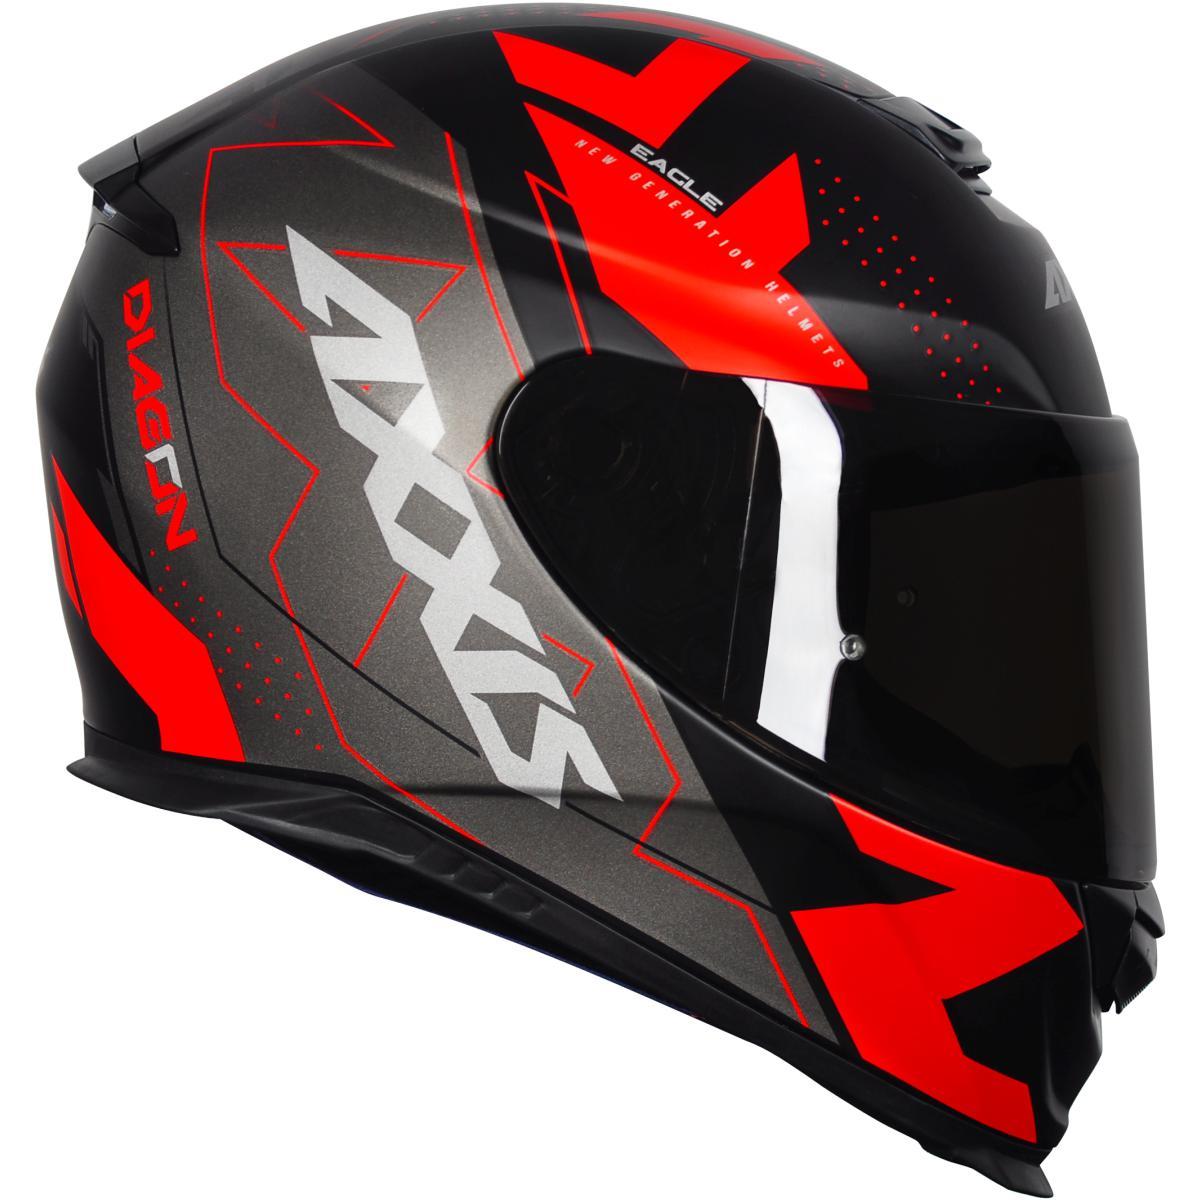 CAPACETE MOTOCICLISTA AXXIS EAGLE DIAGON MATT BLACK/GREY/RED